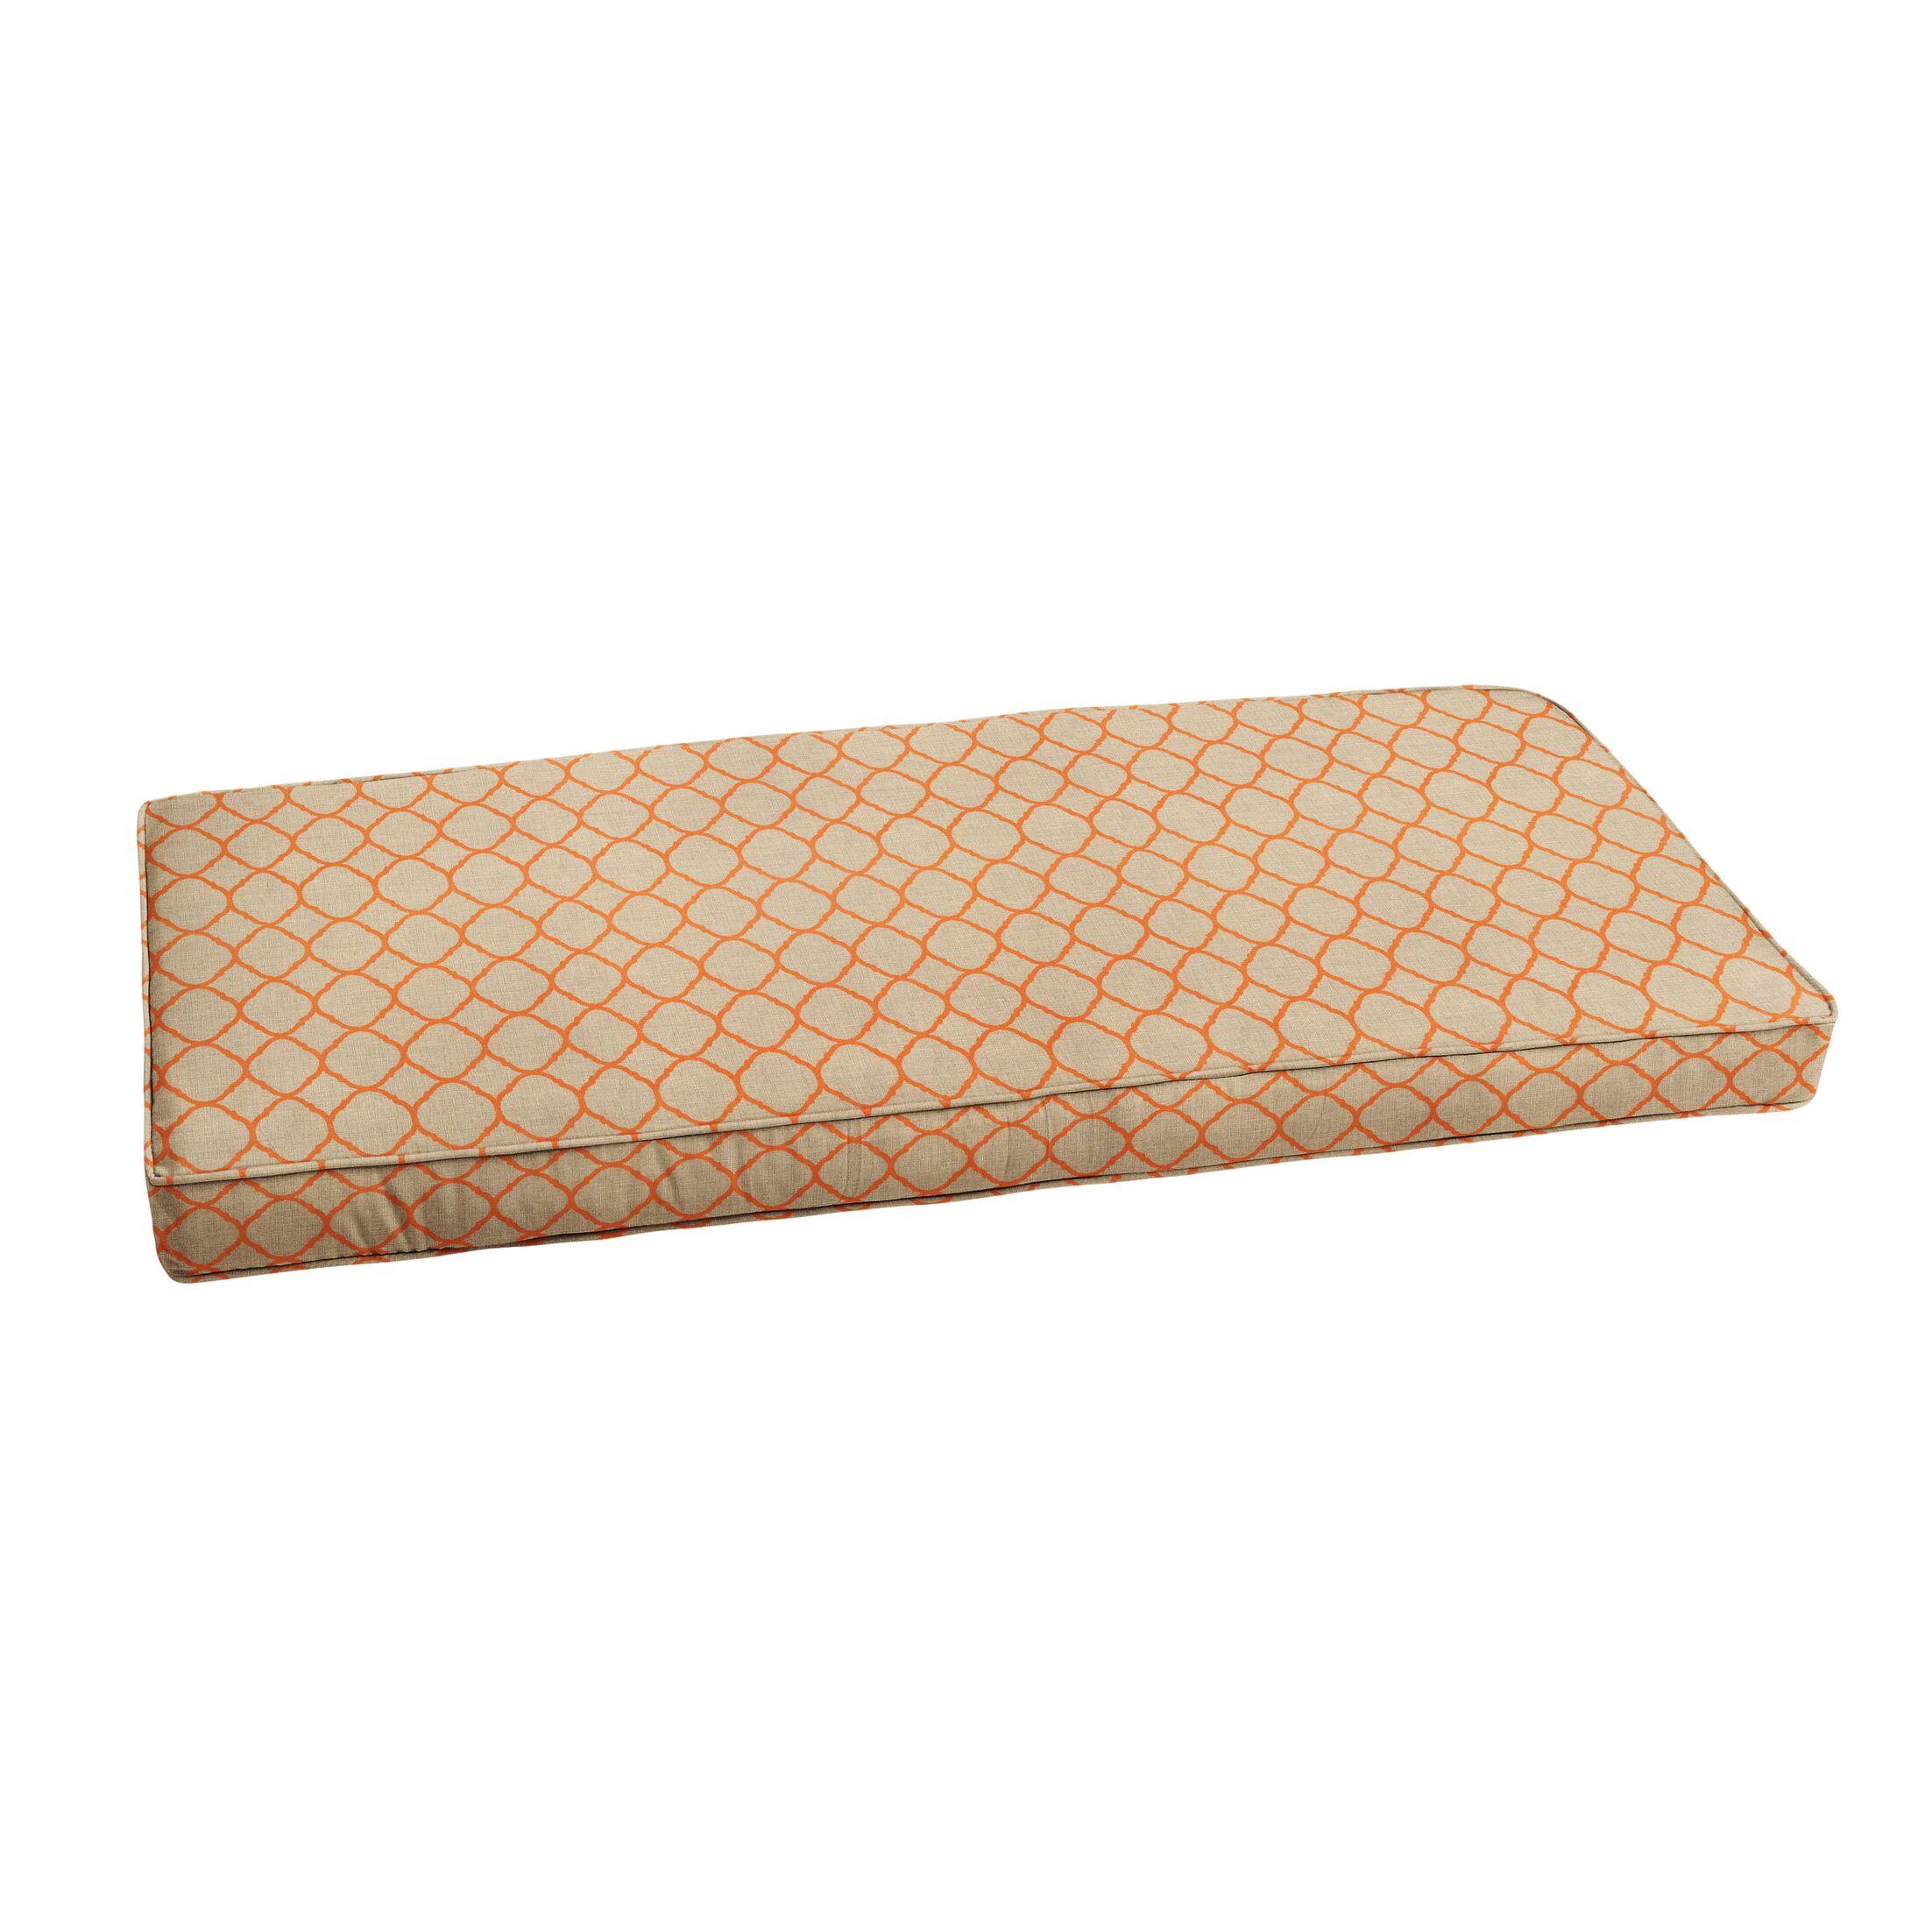 Indoor/Outdoor Sunbrella Bench Cushion Size: 40